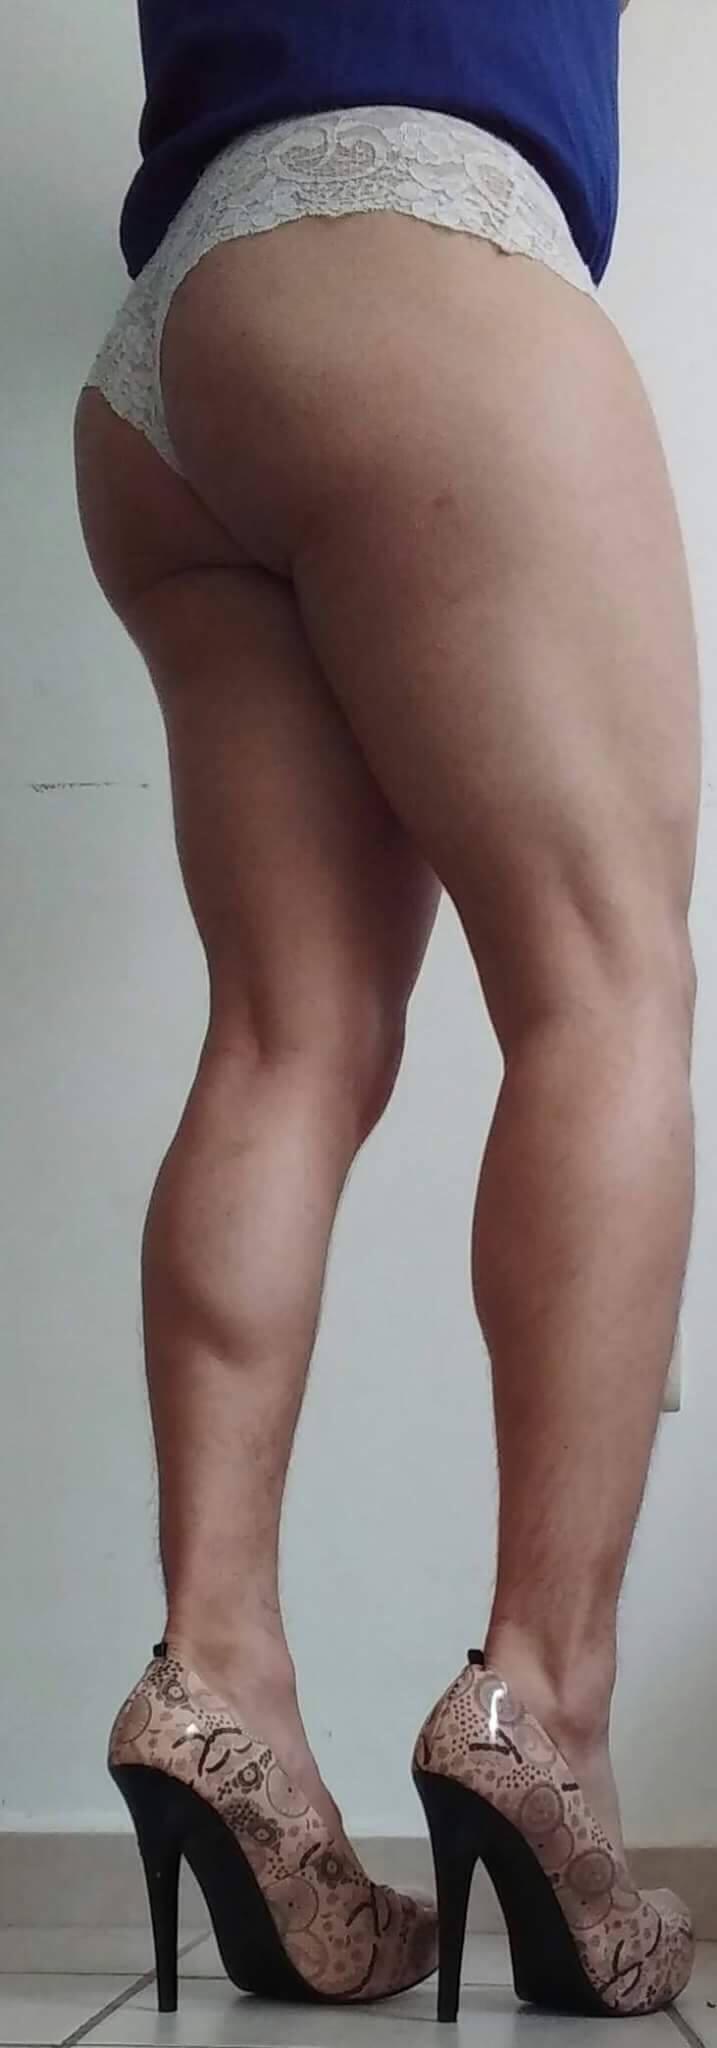 sexy legs tgirl